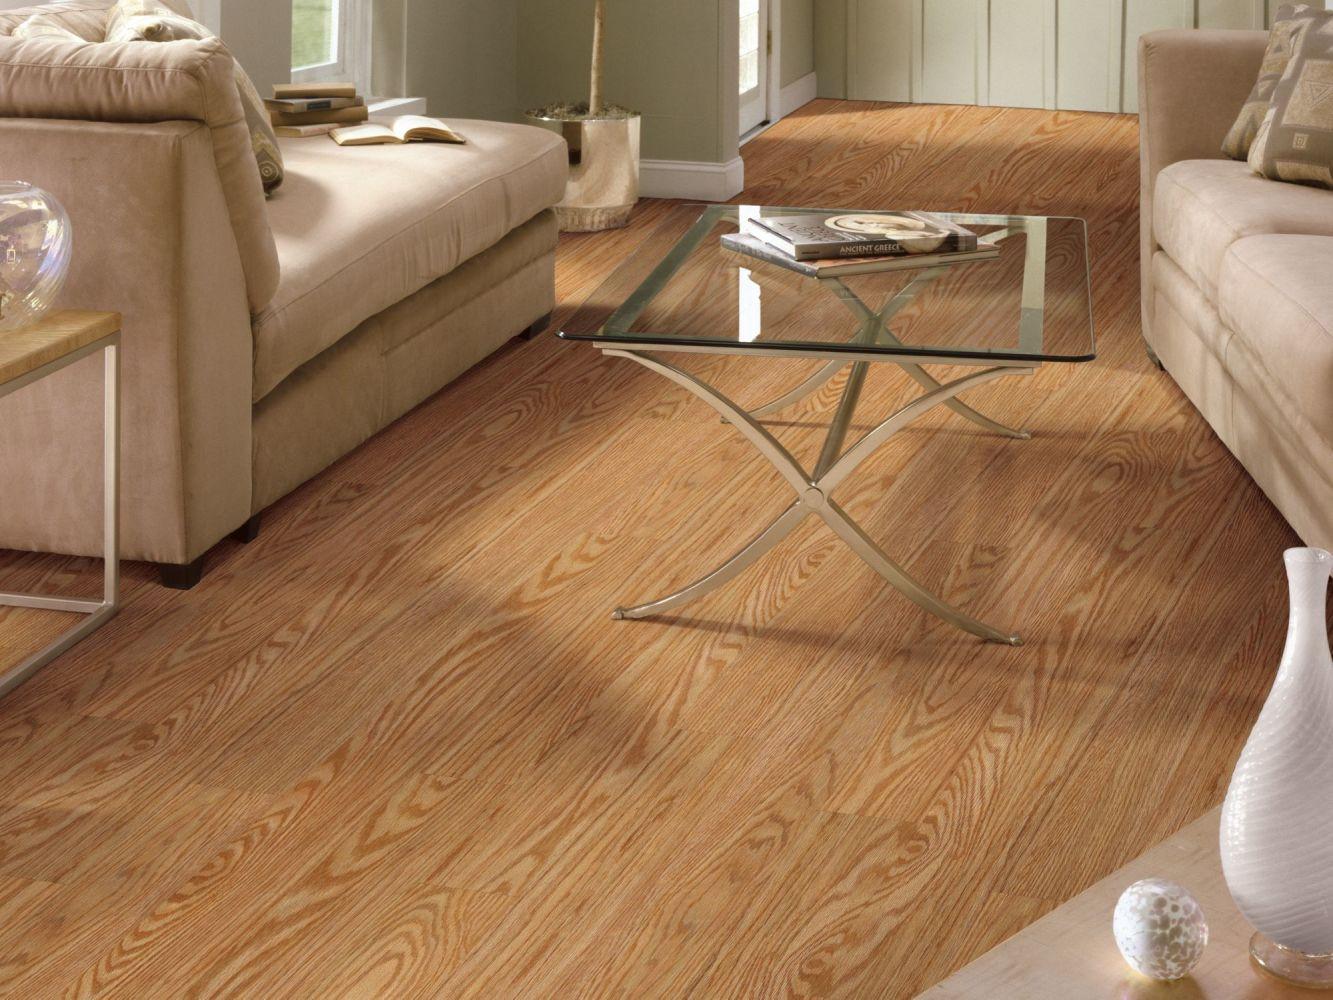 Shaw Floors Resilient Property Solutions Cameron Pl Click Dutch 00220_VE181